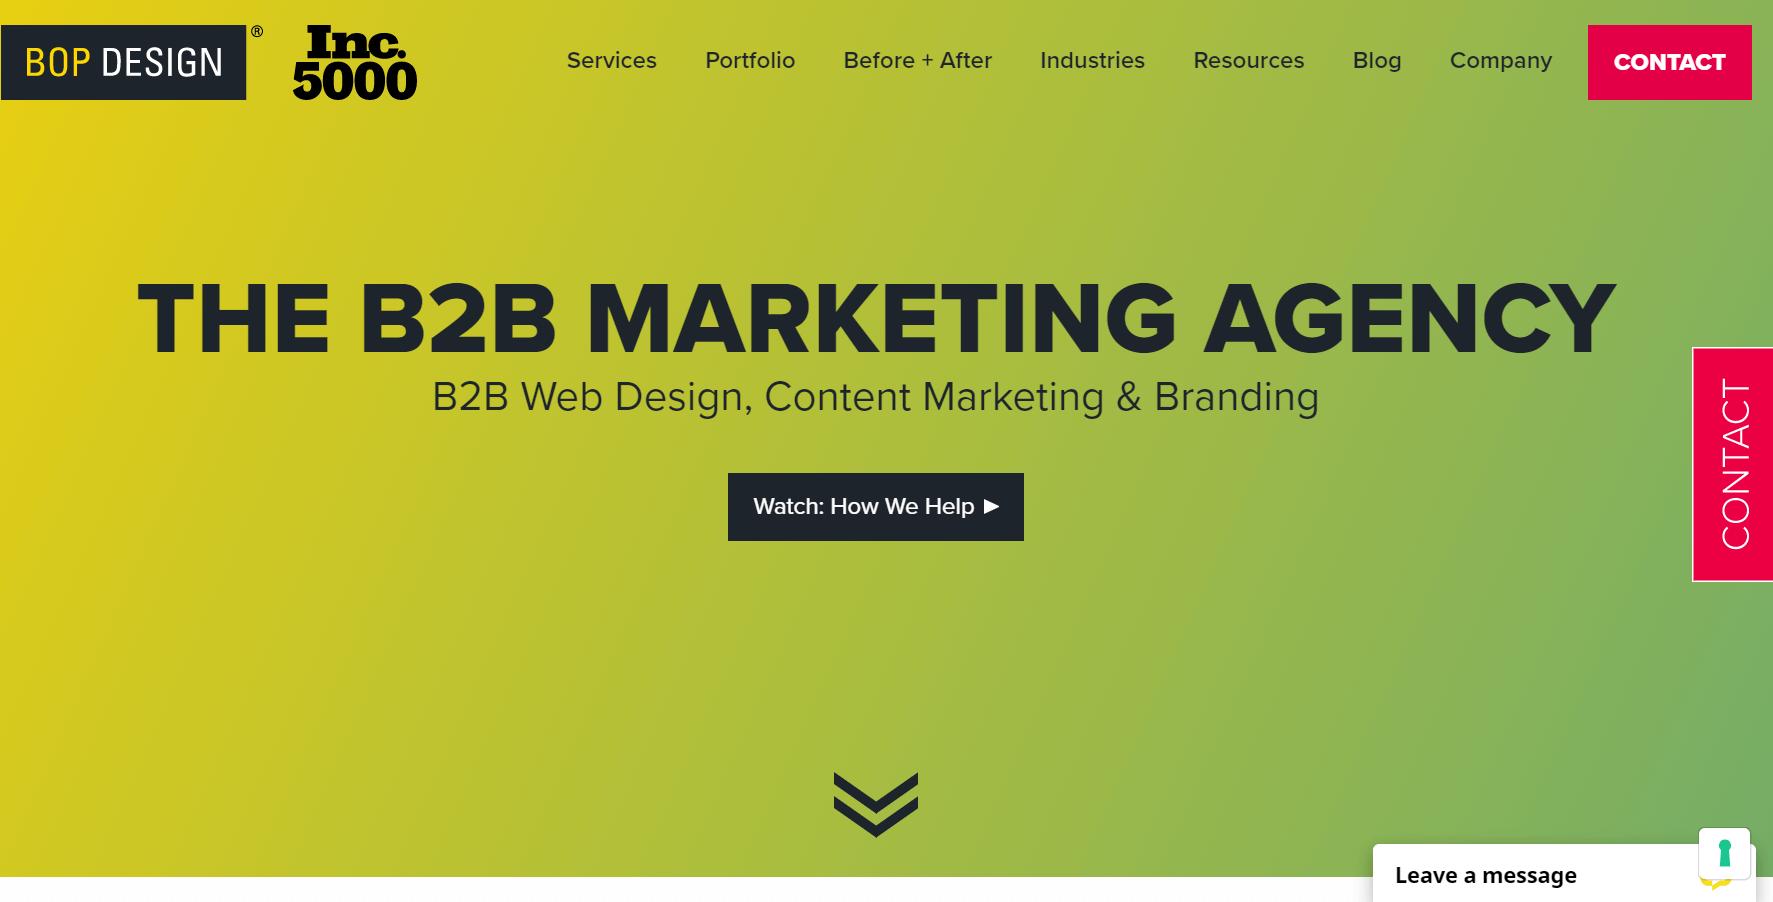 bop marketing agency